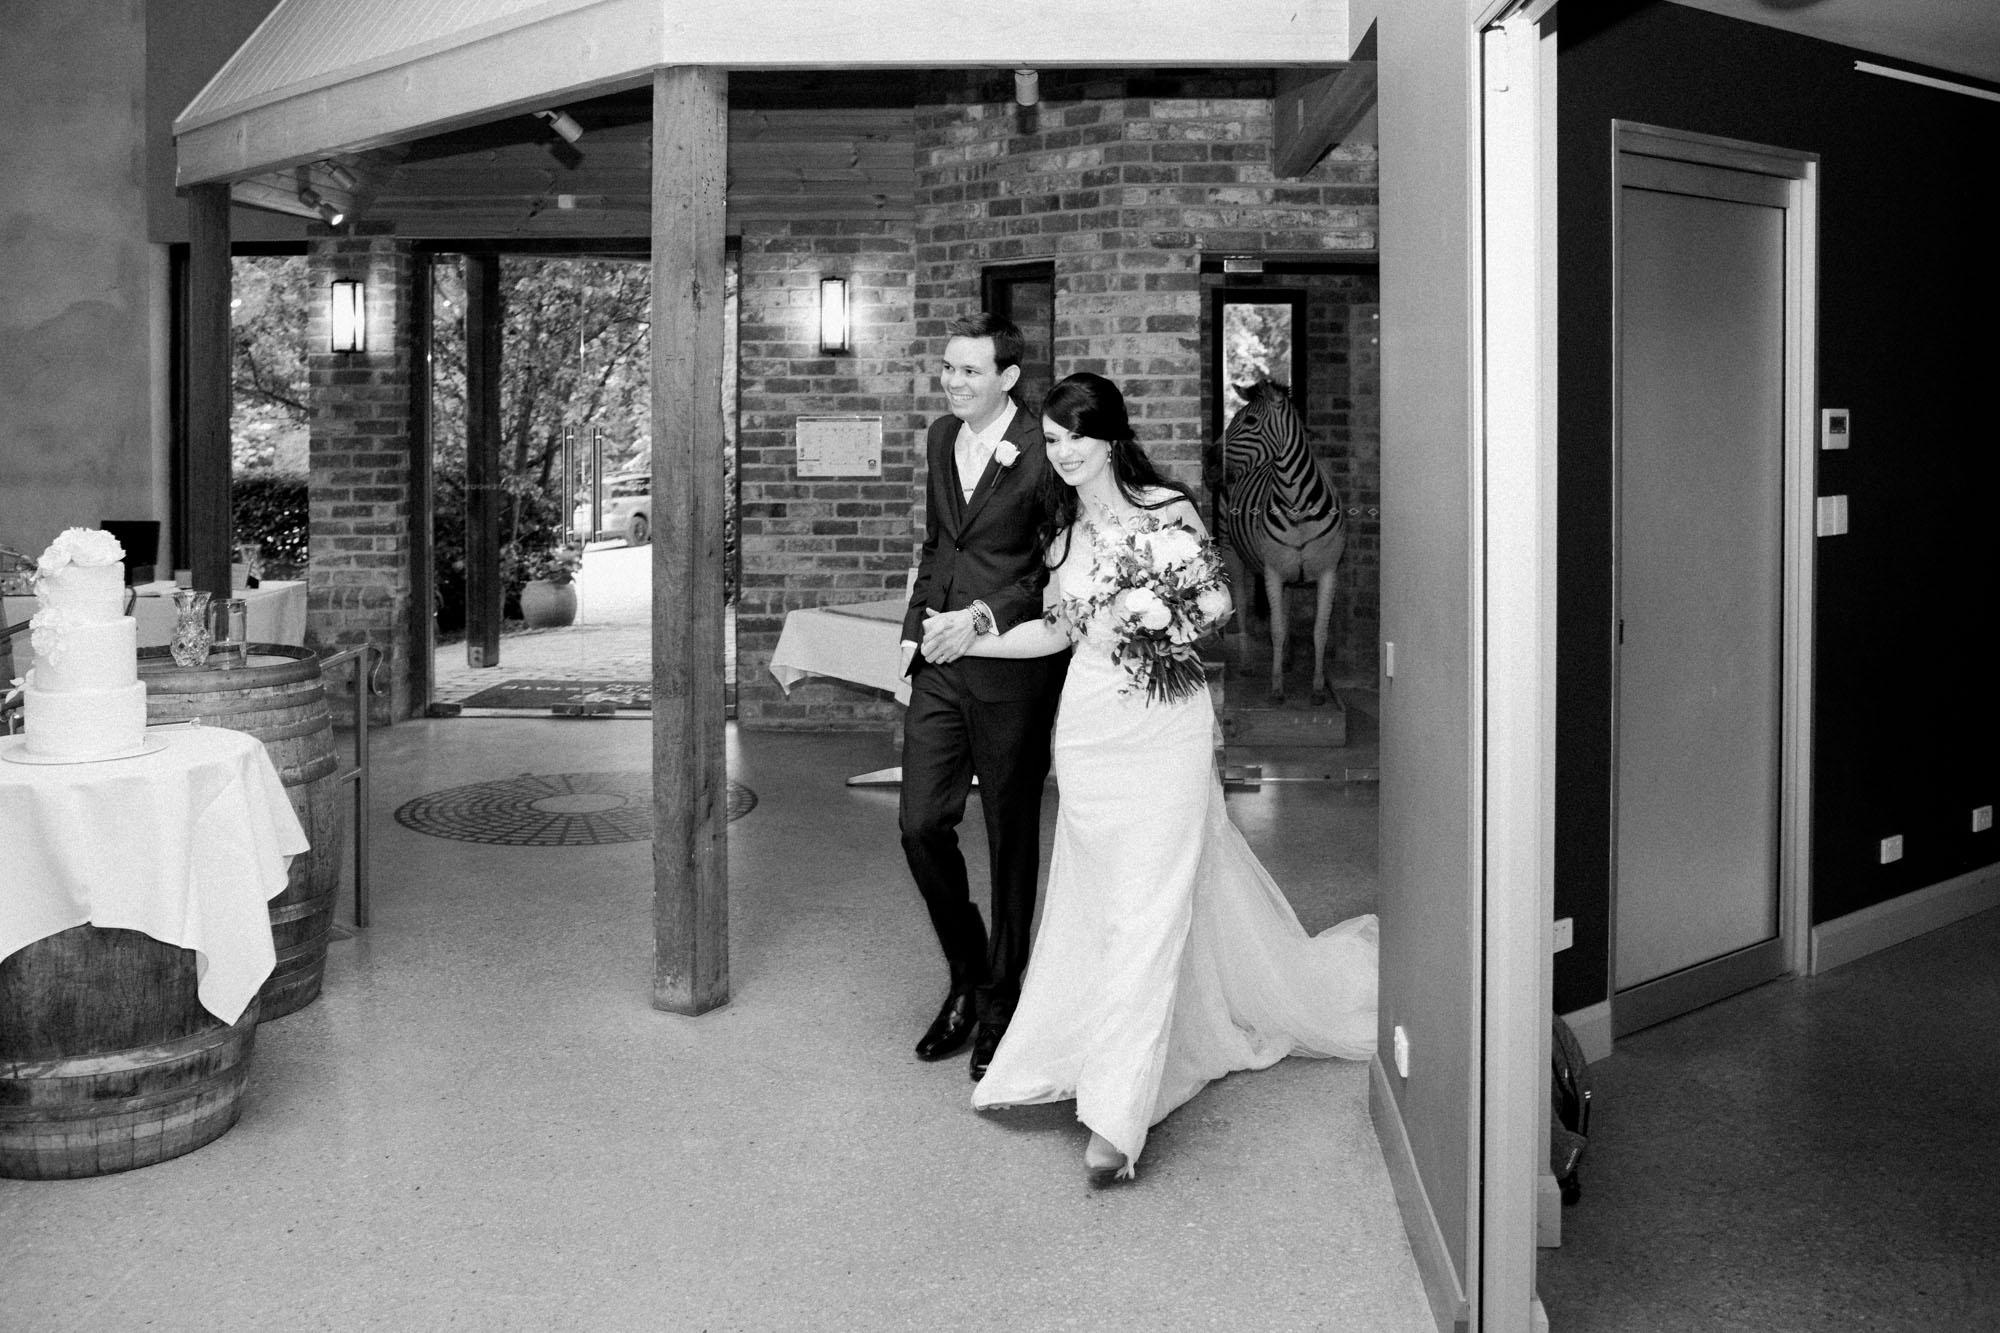 Glen-Ewin-Estate-wedding-photography-077.jpg